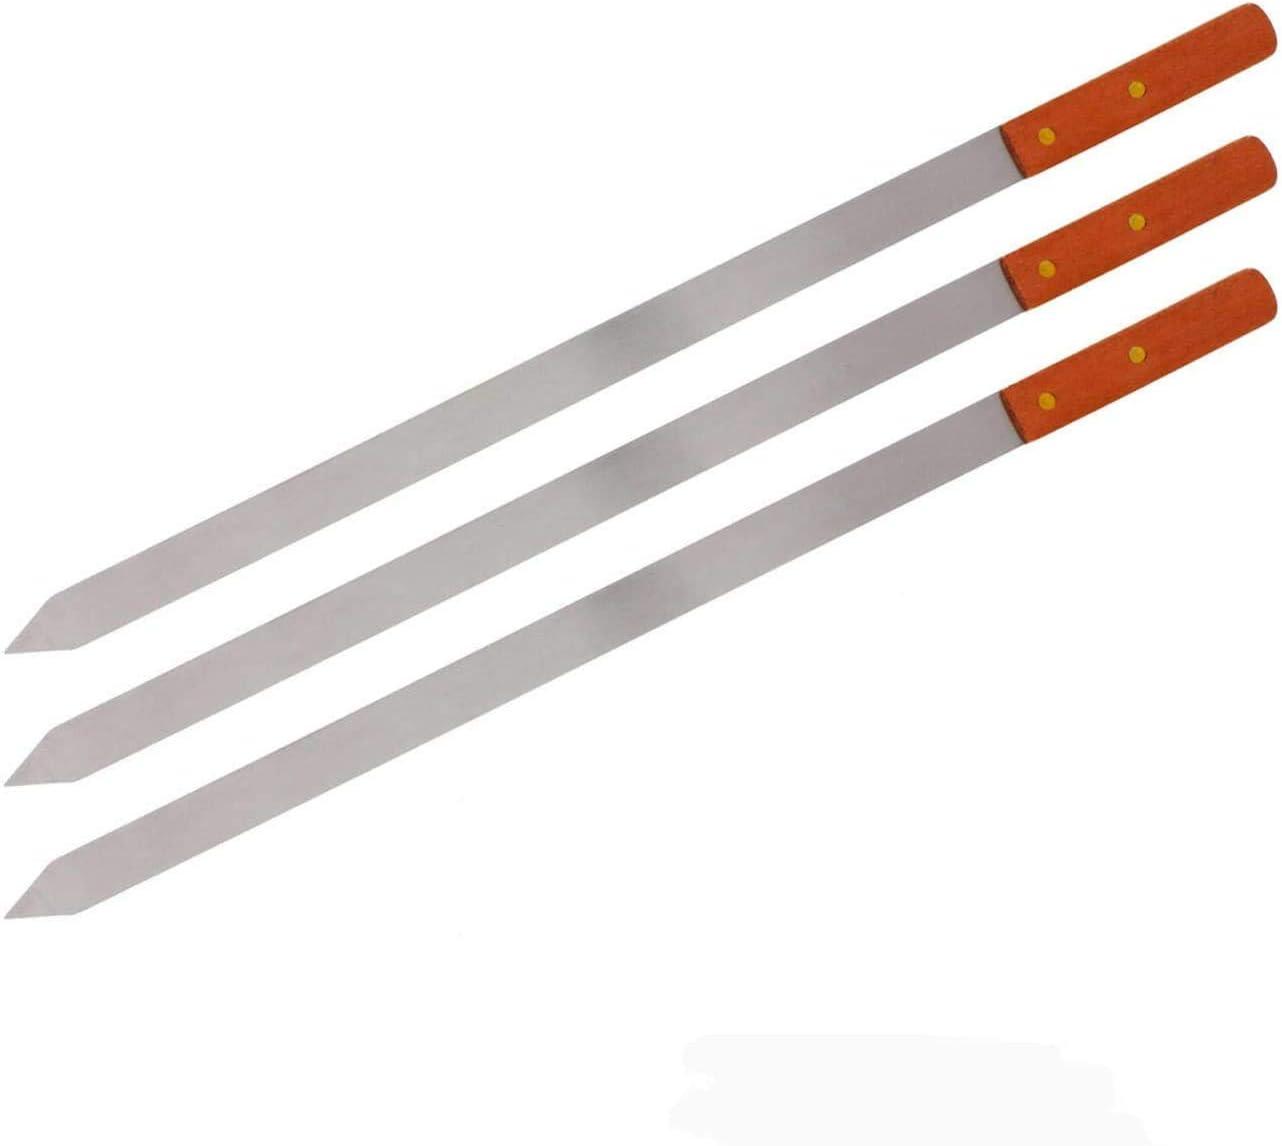 pack of 12 WOODEN HANDEL Set of 2 4 6 8 12BBQ Grilling Kebab Skewers Flat Reusable Metal Skewer Sticks for BBQ Party Essentials Shish Kabob 58CM LONG Cocktail LONG BBQ Barbecue Skewers